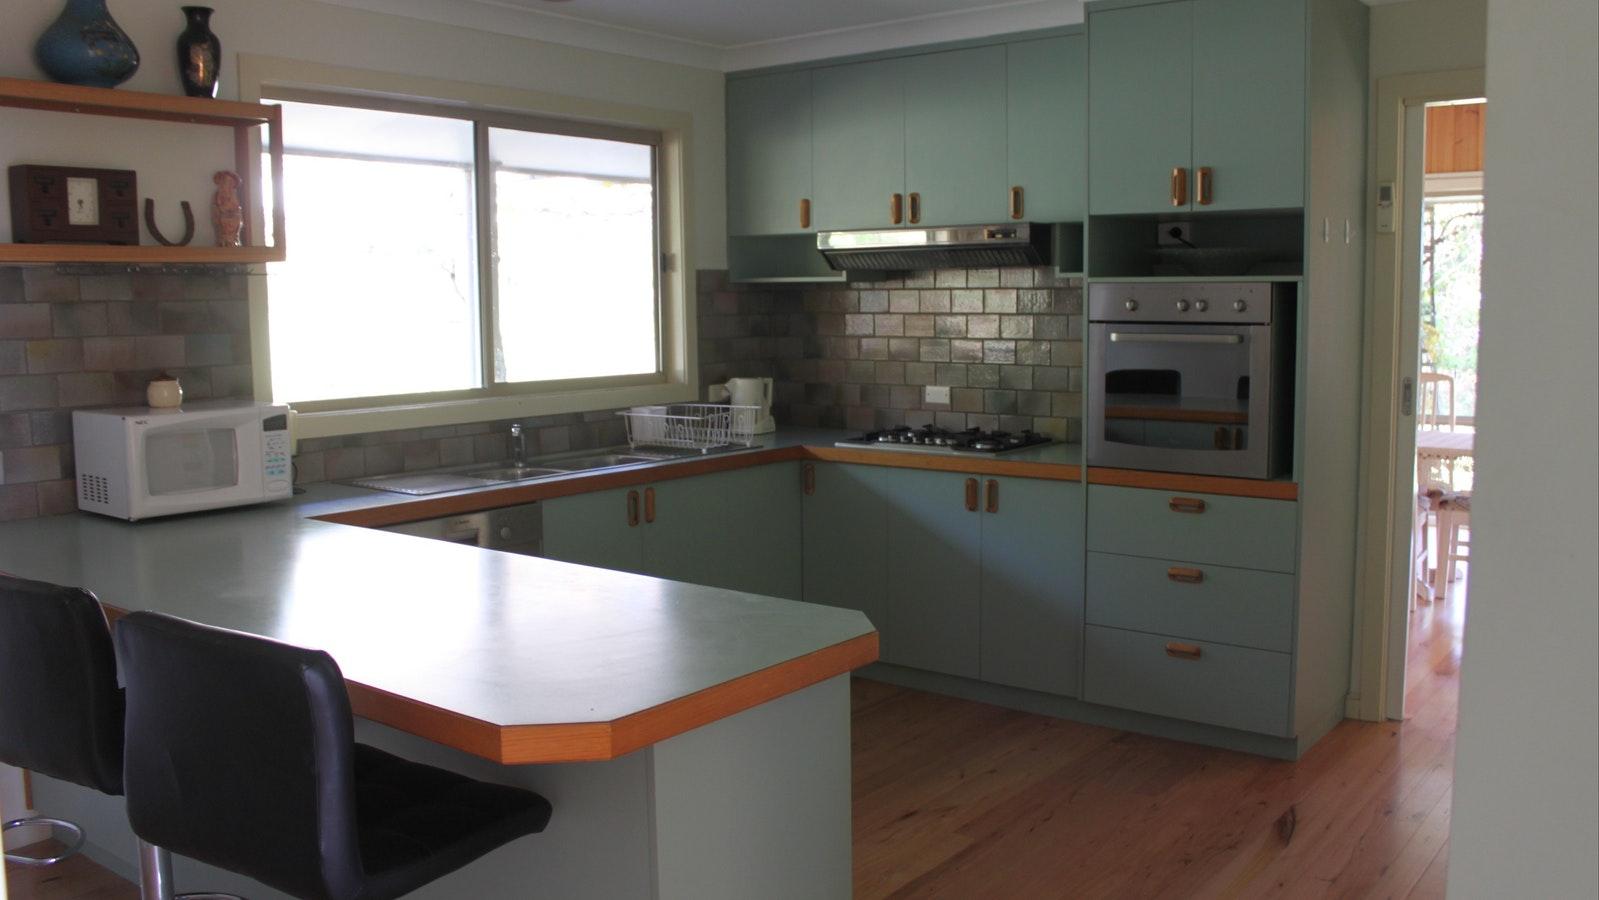 Kitchen in the Black Olive